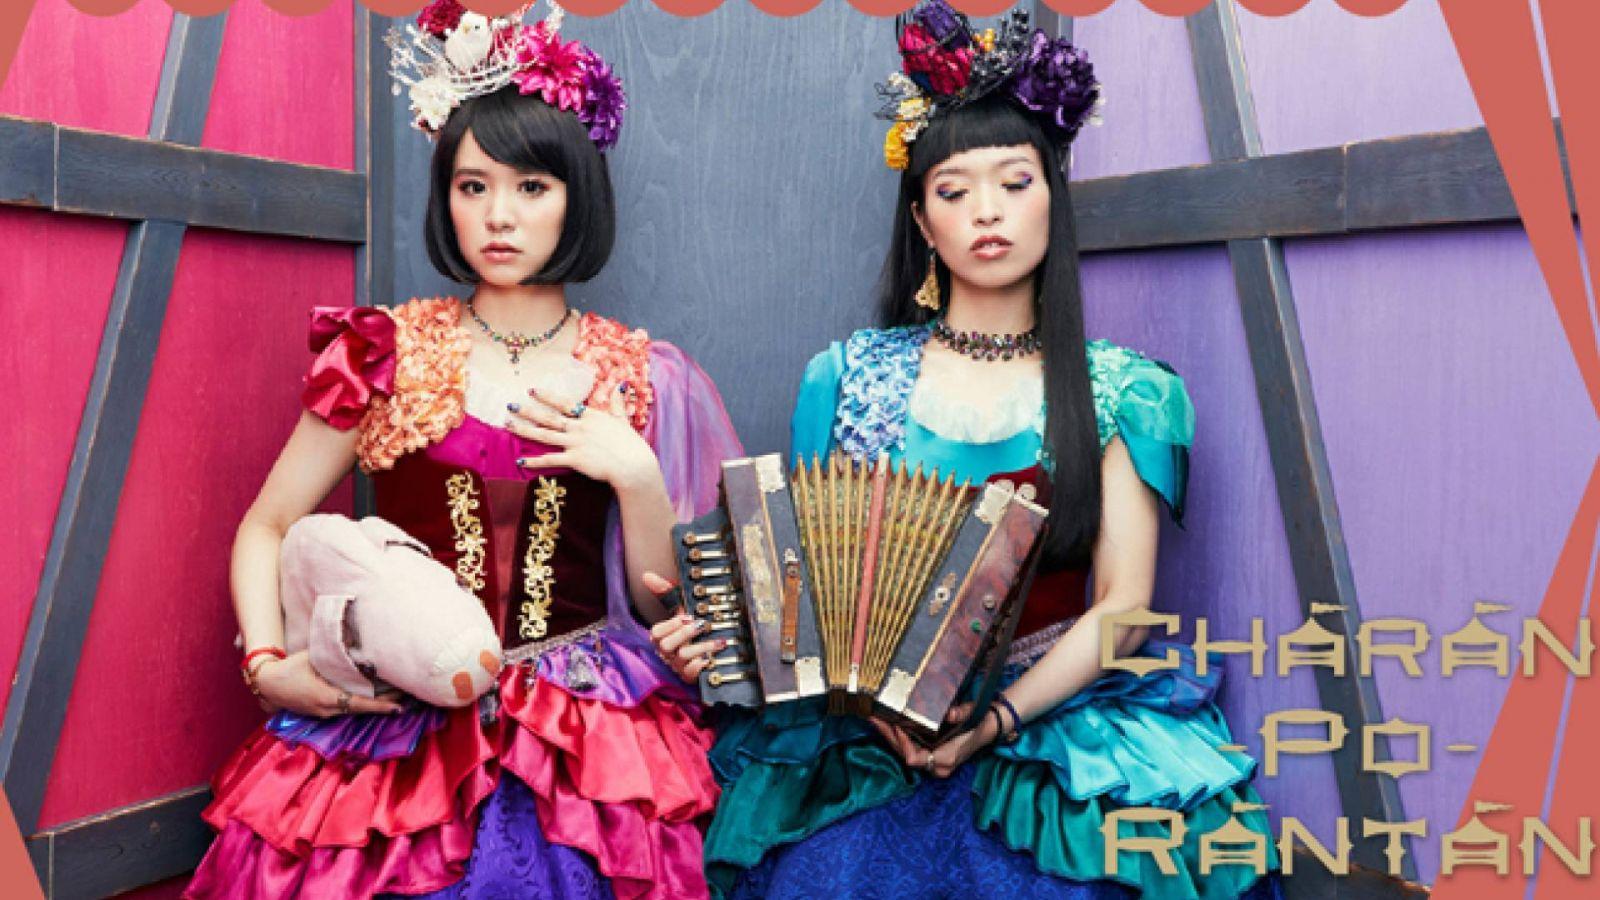 Novo álbum do Charan-Po-Rantan © Charan-Po-Rantan